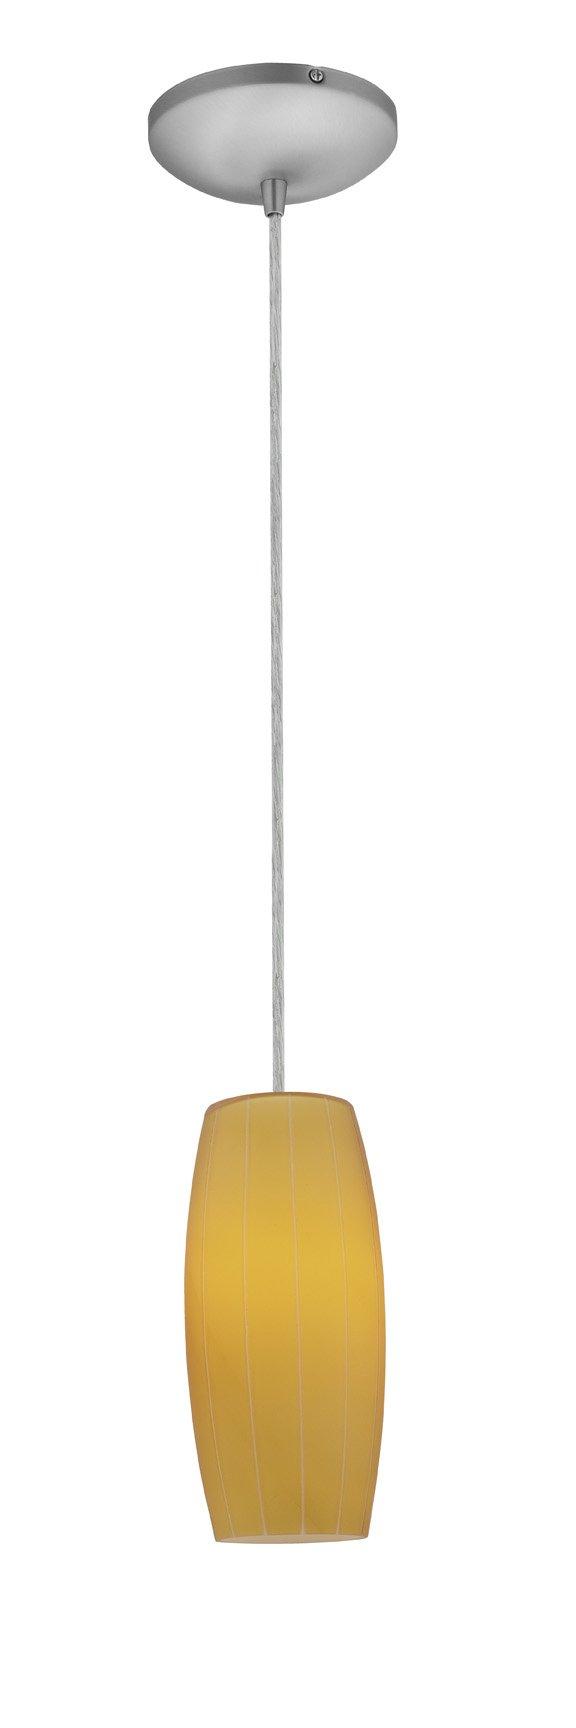 Cognac Glass Pendant - 1-Light Pendant - Cord - Brushed Steel Finish - Amber Glass Shade